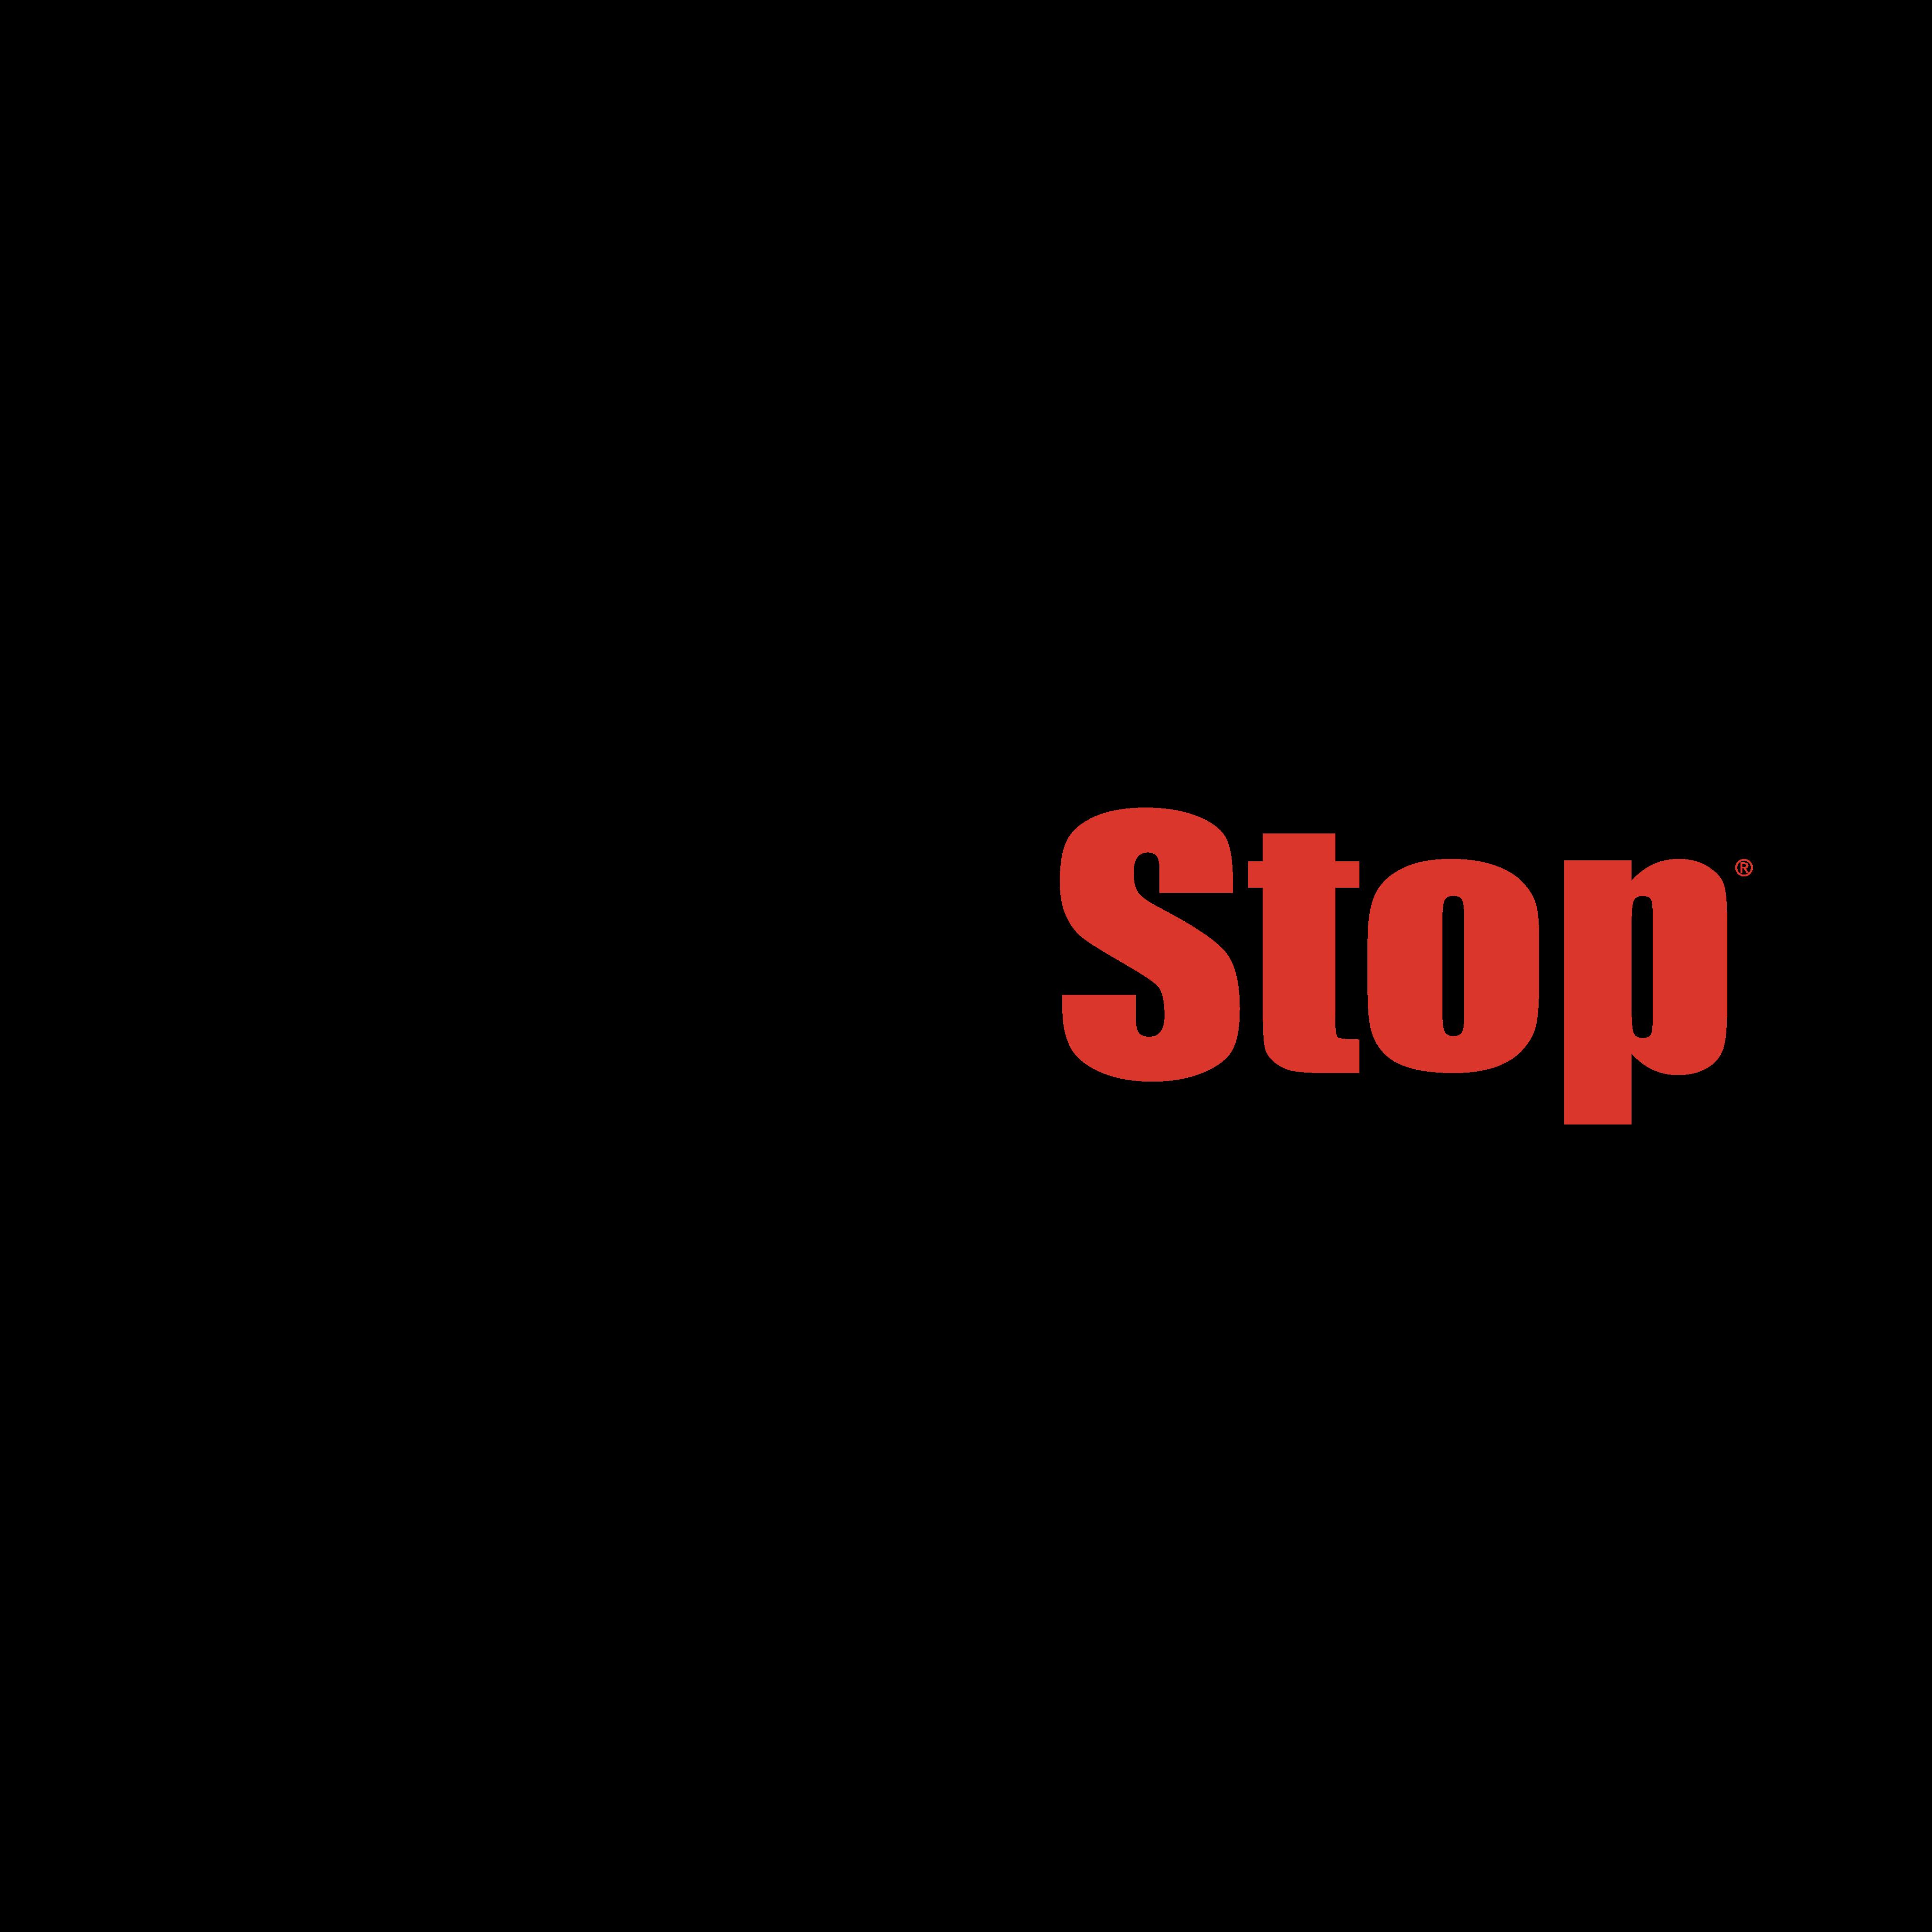 gamestop logo 0 - GamesStop Logo